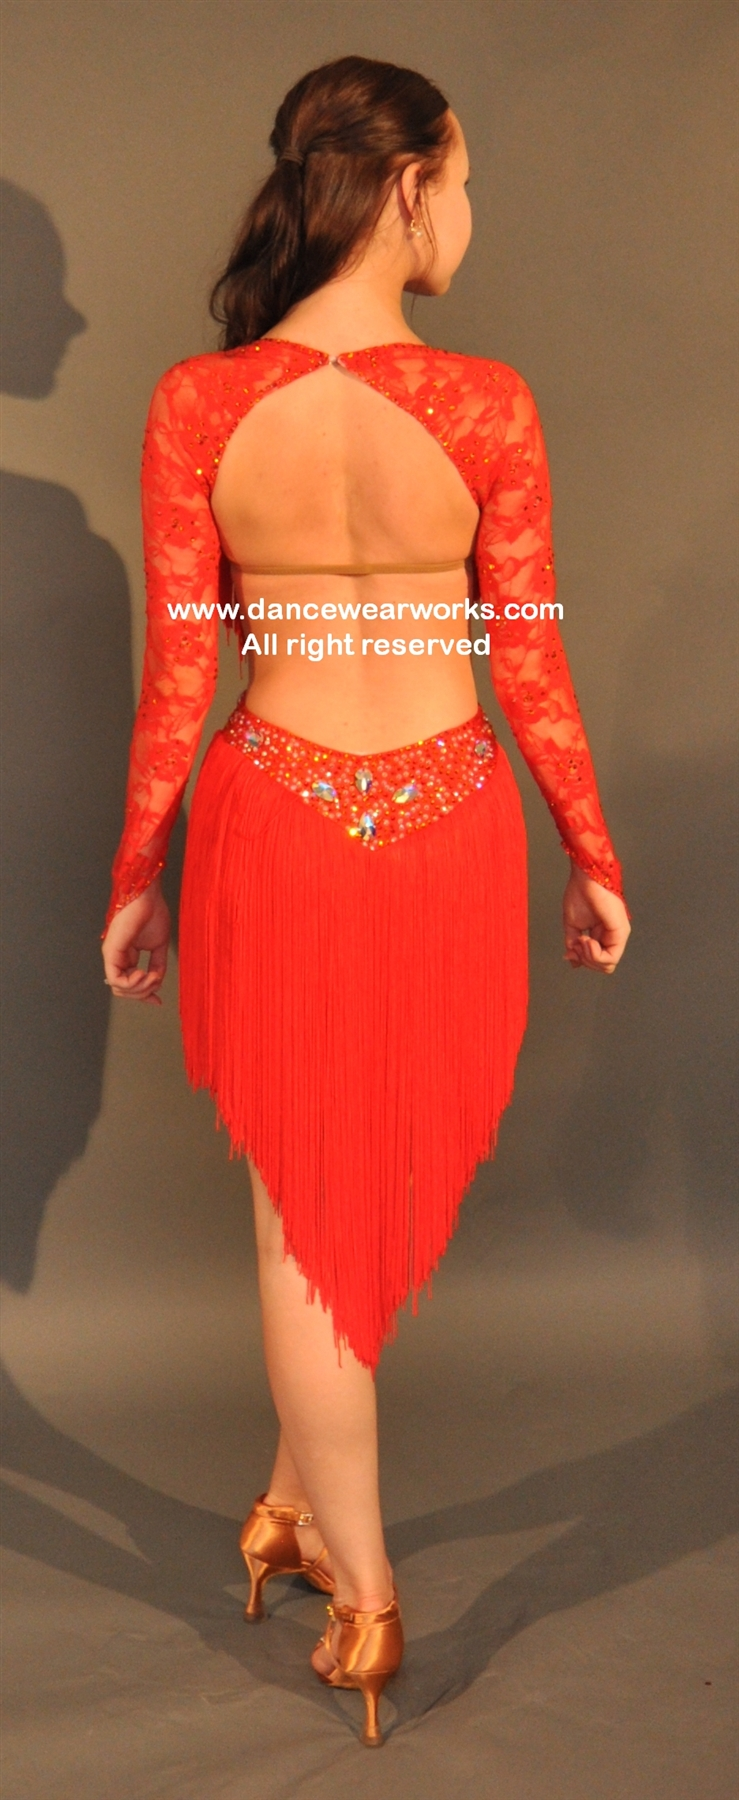 Sexy Red Fringe Latin Dress